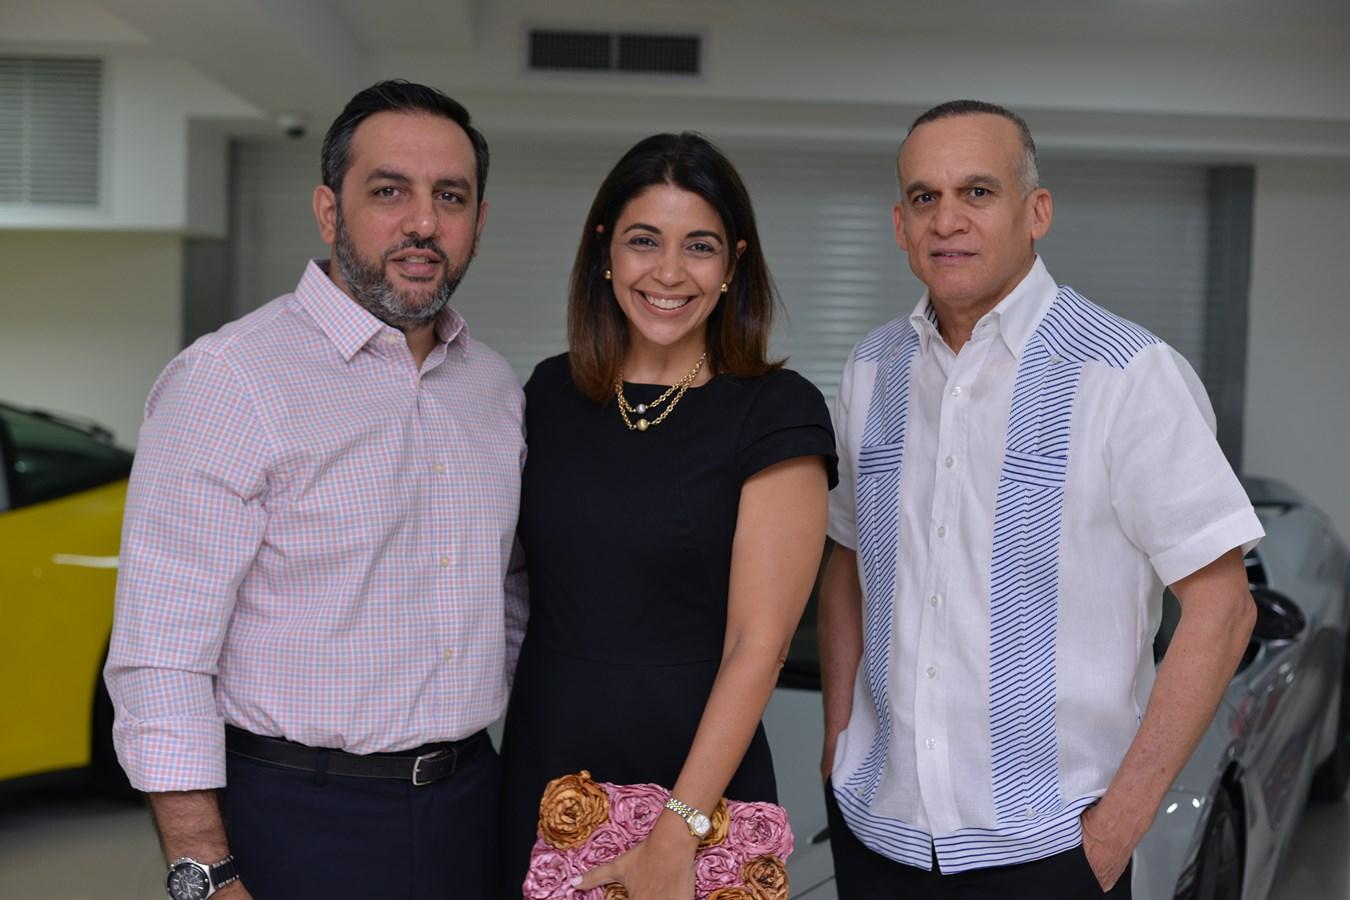 David Jadalla,Ana de Jadalla,Alexis Calderon